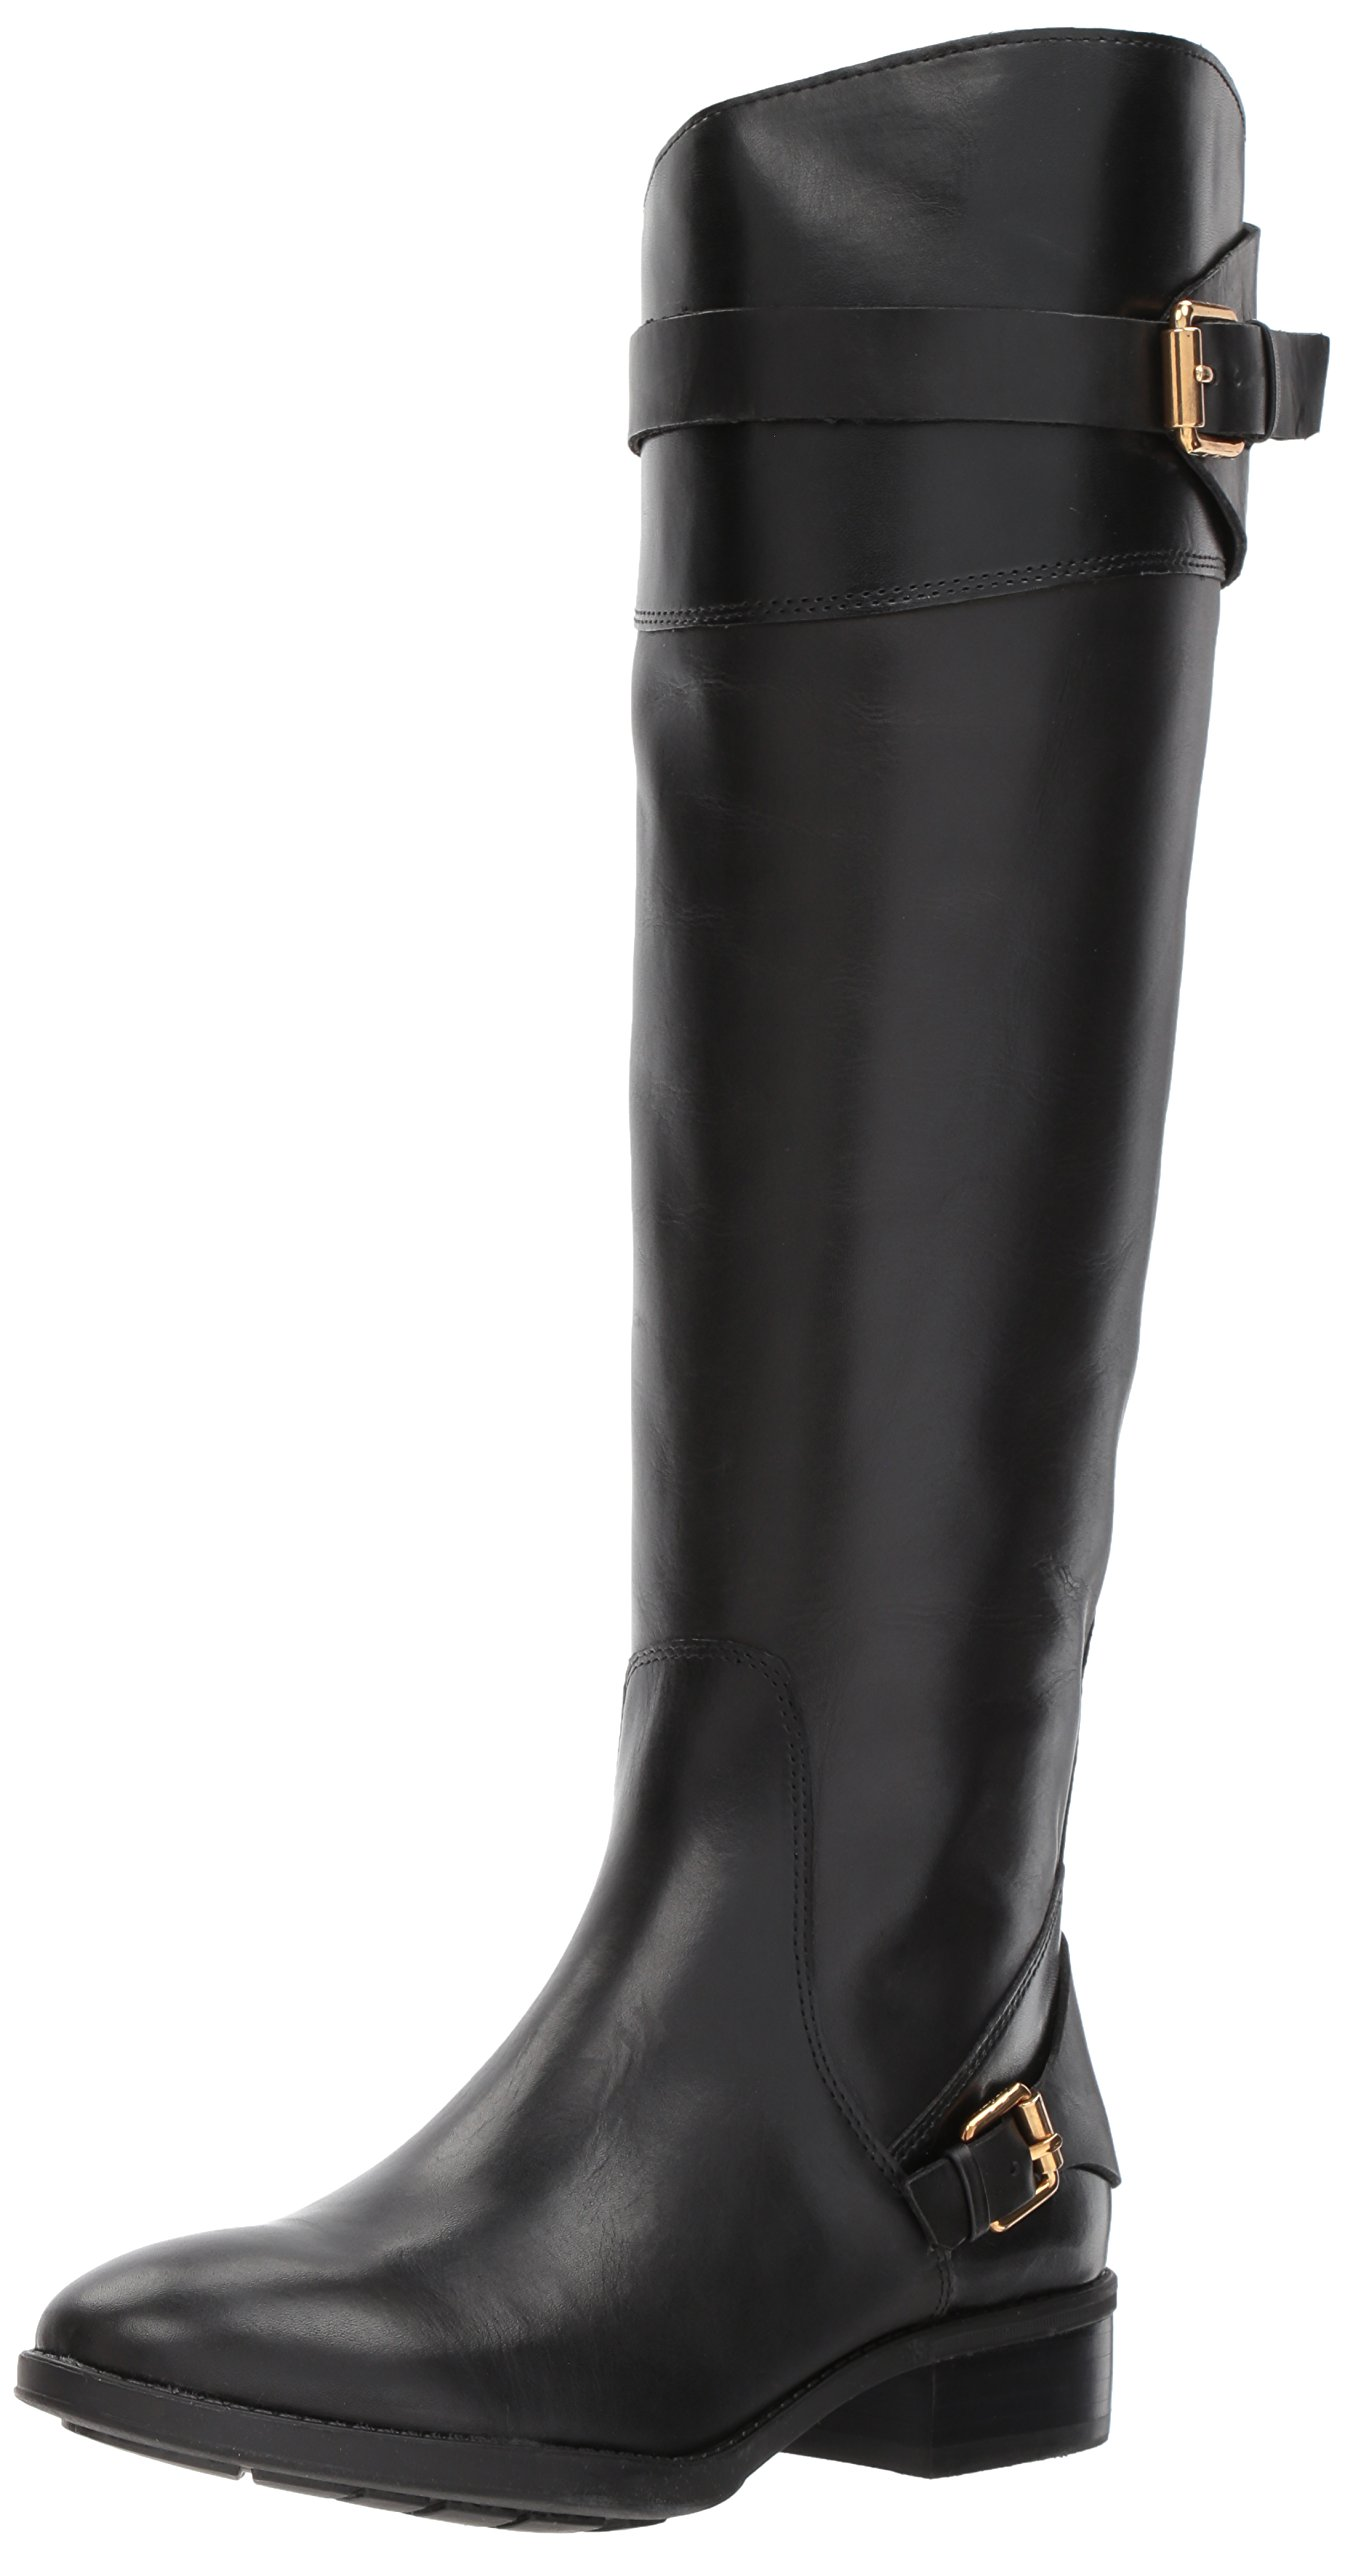 Sam Edelman Women's Portman Knee High Boot, Black, 9 Medium US